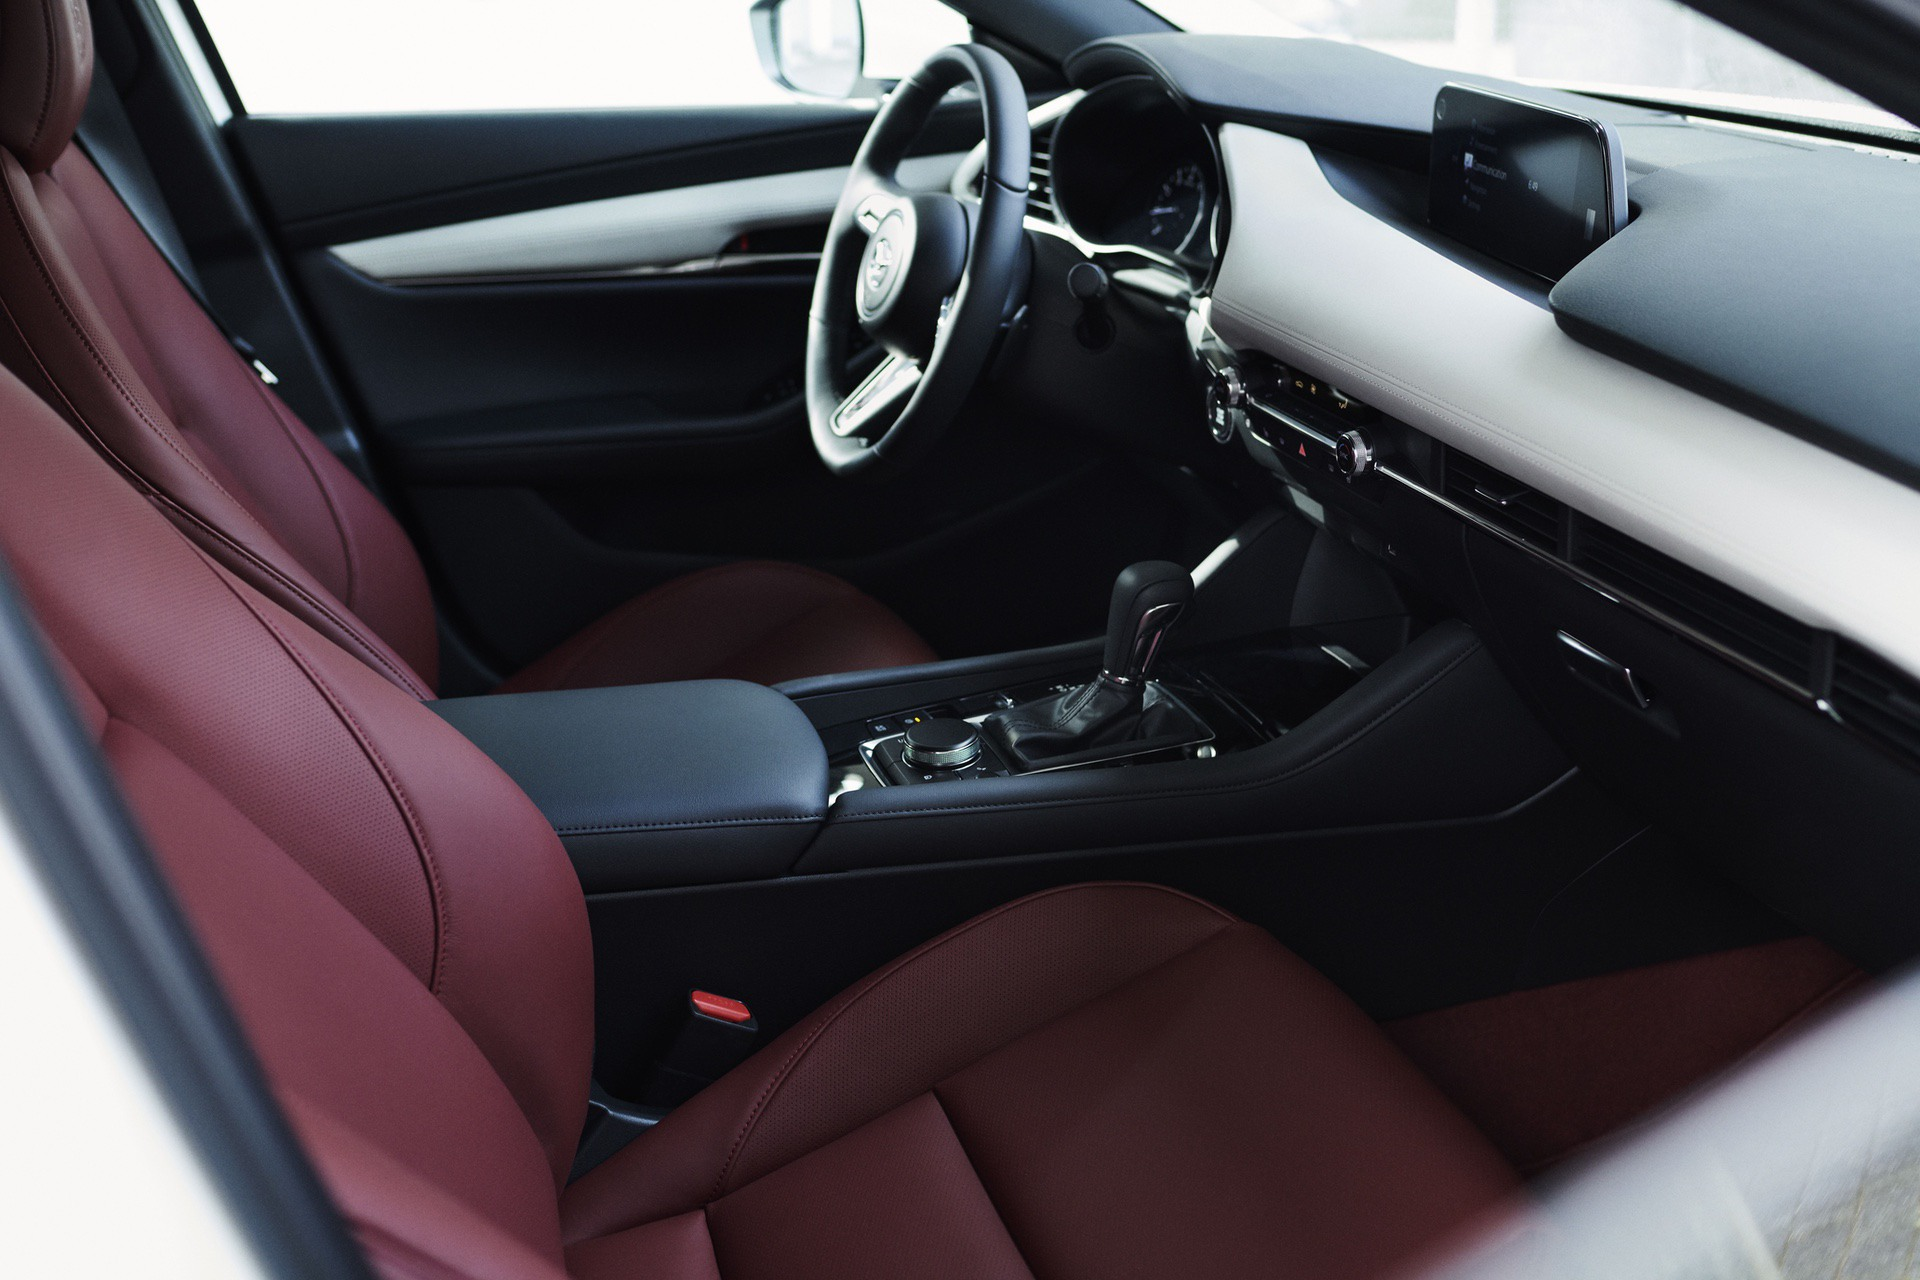 2020_100thSV_BRD15_EU_LHD_Mazda3_Interior